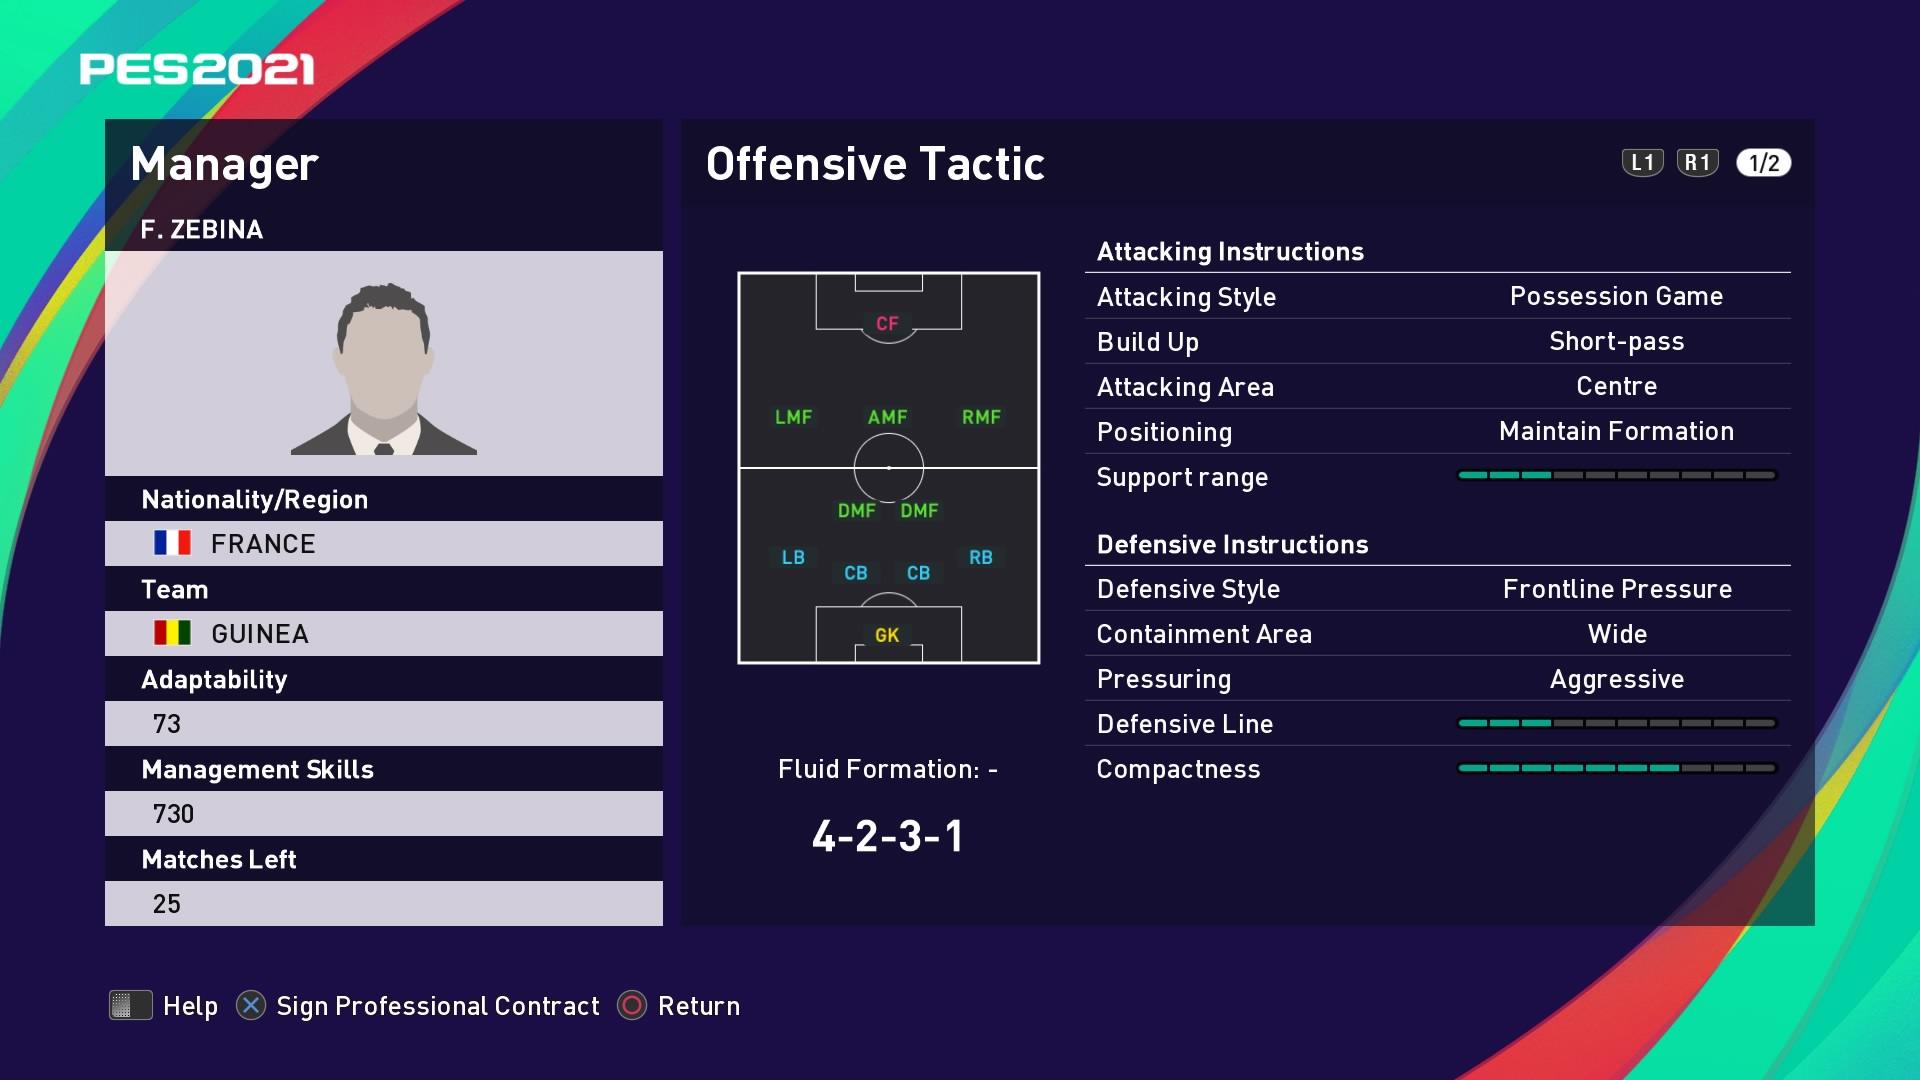 F. Zebina (Didier Six) Offensive Tactic in PES 2021 myClub